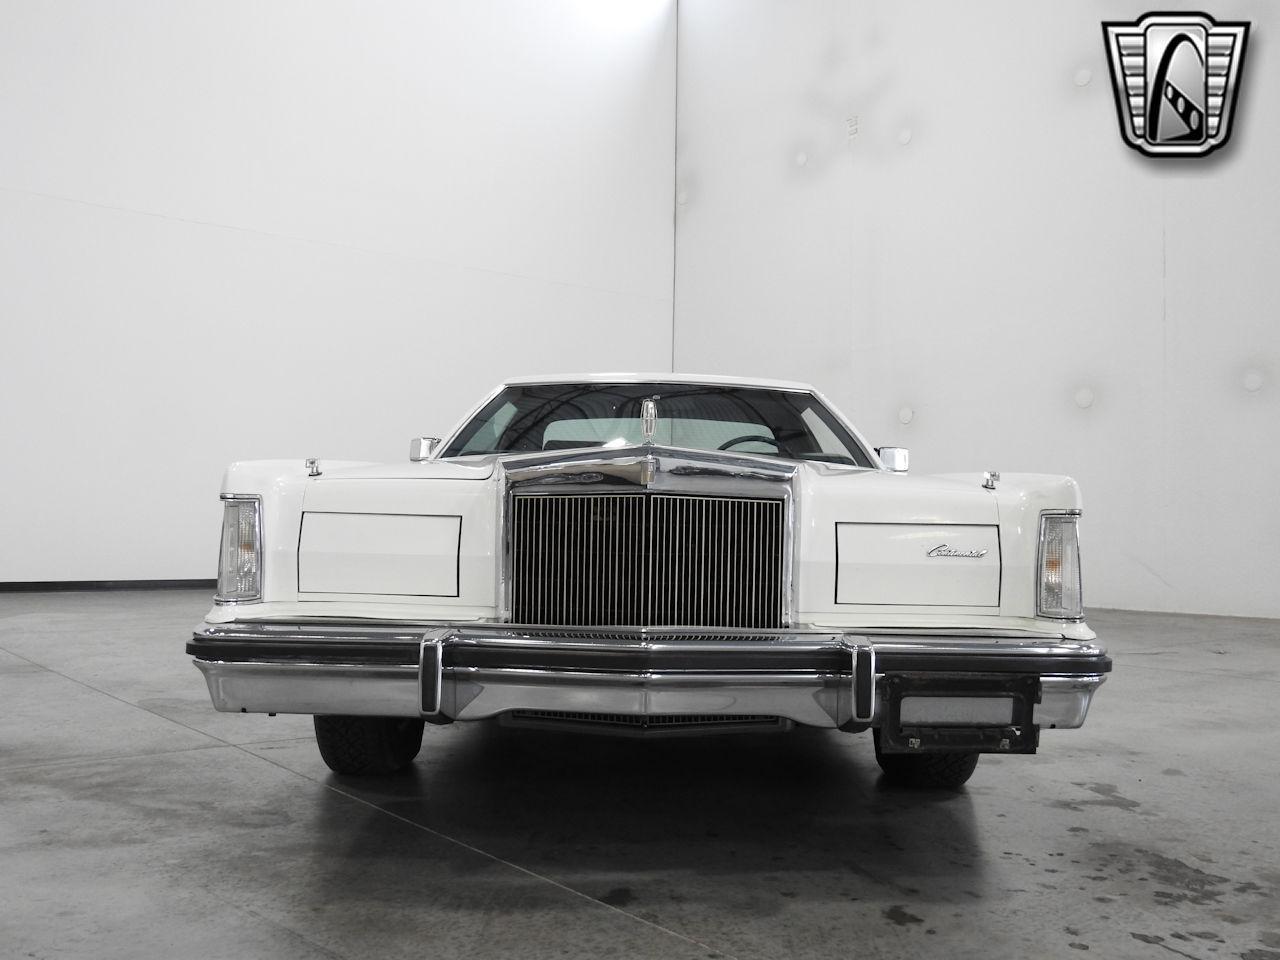 1979 Lincoln MKV 22